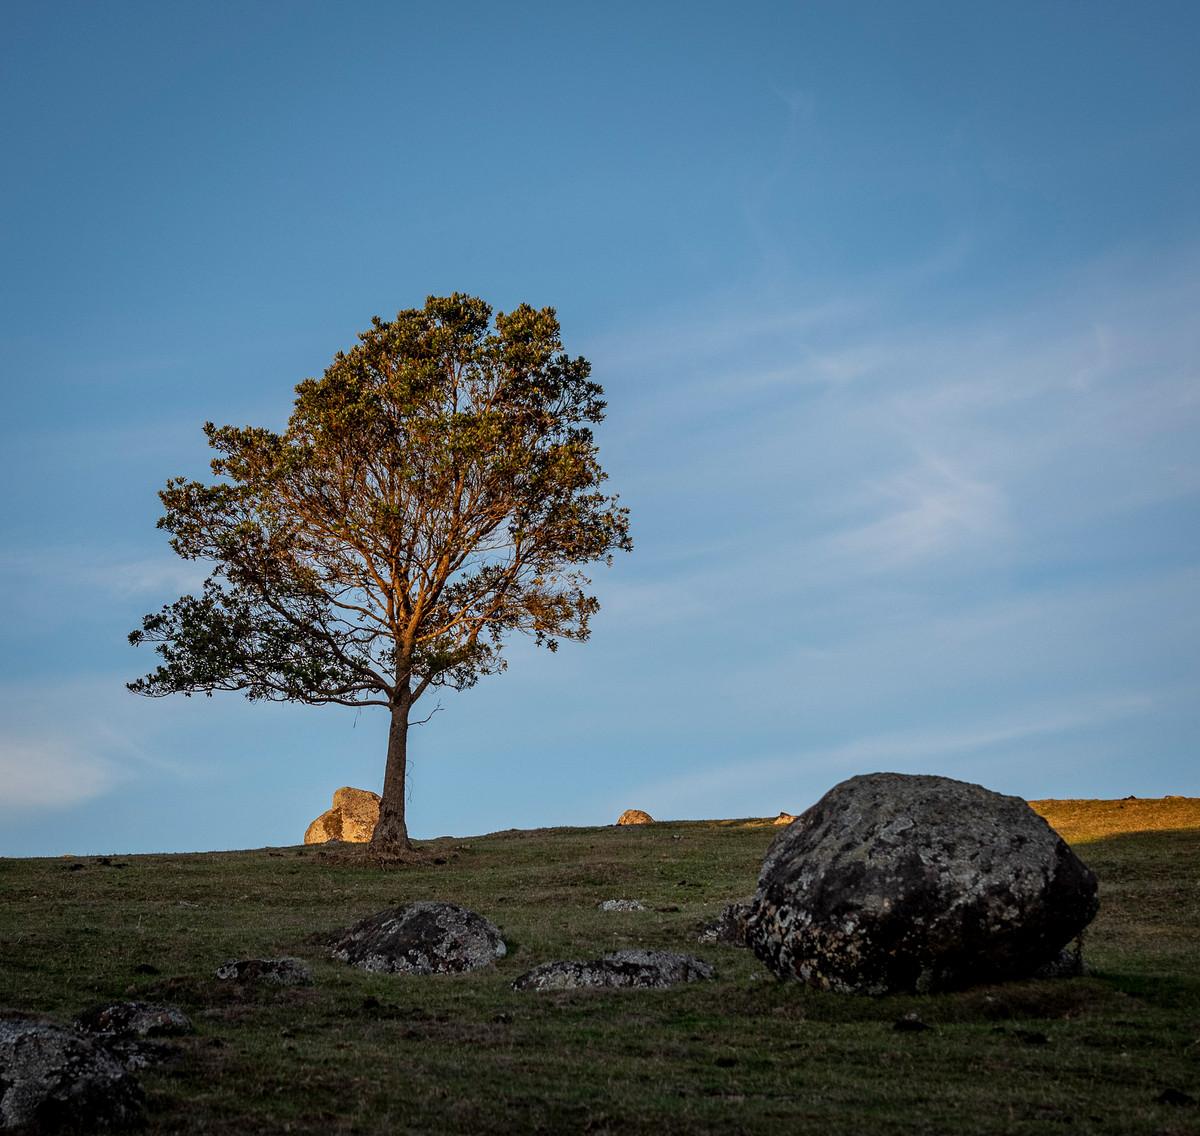 Siddho-Photography-LS-C-24.jpg